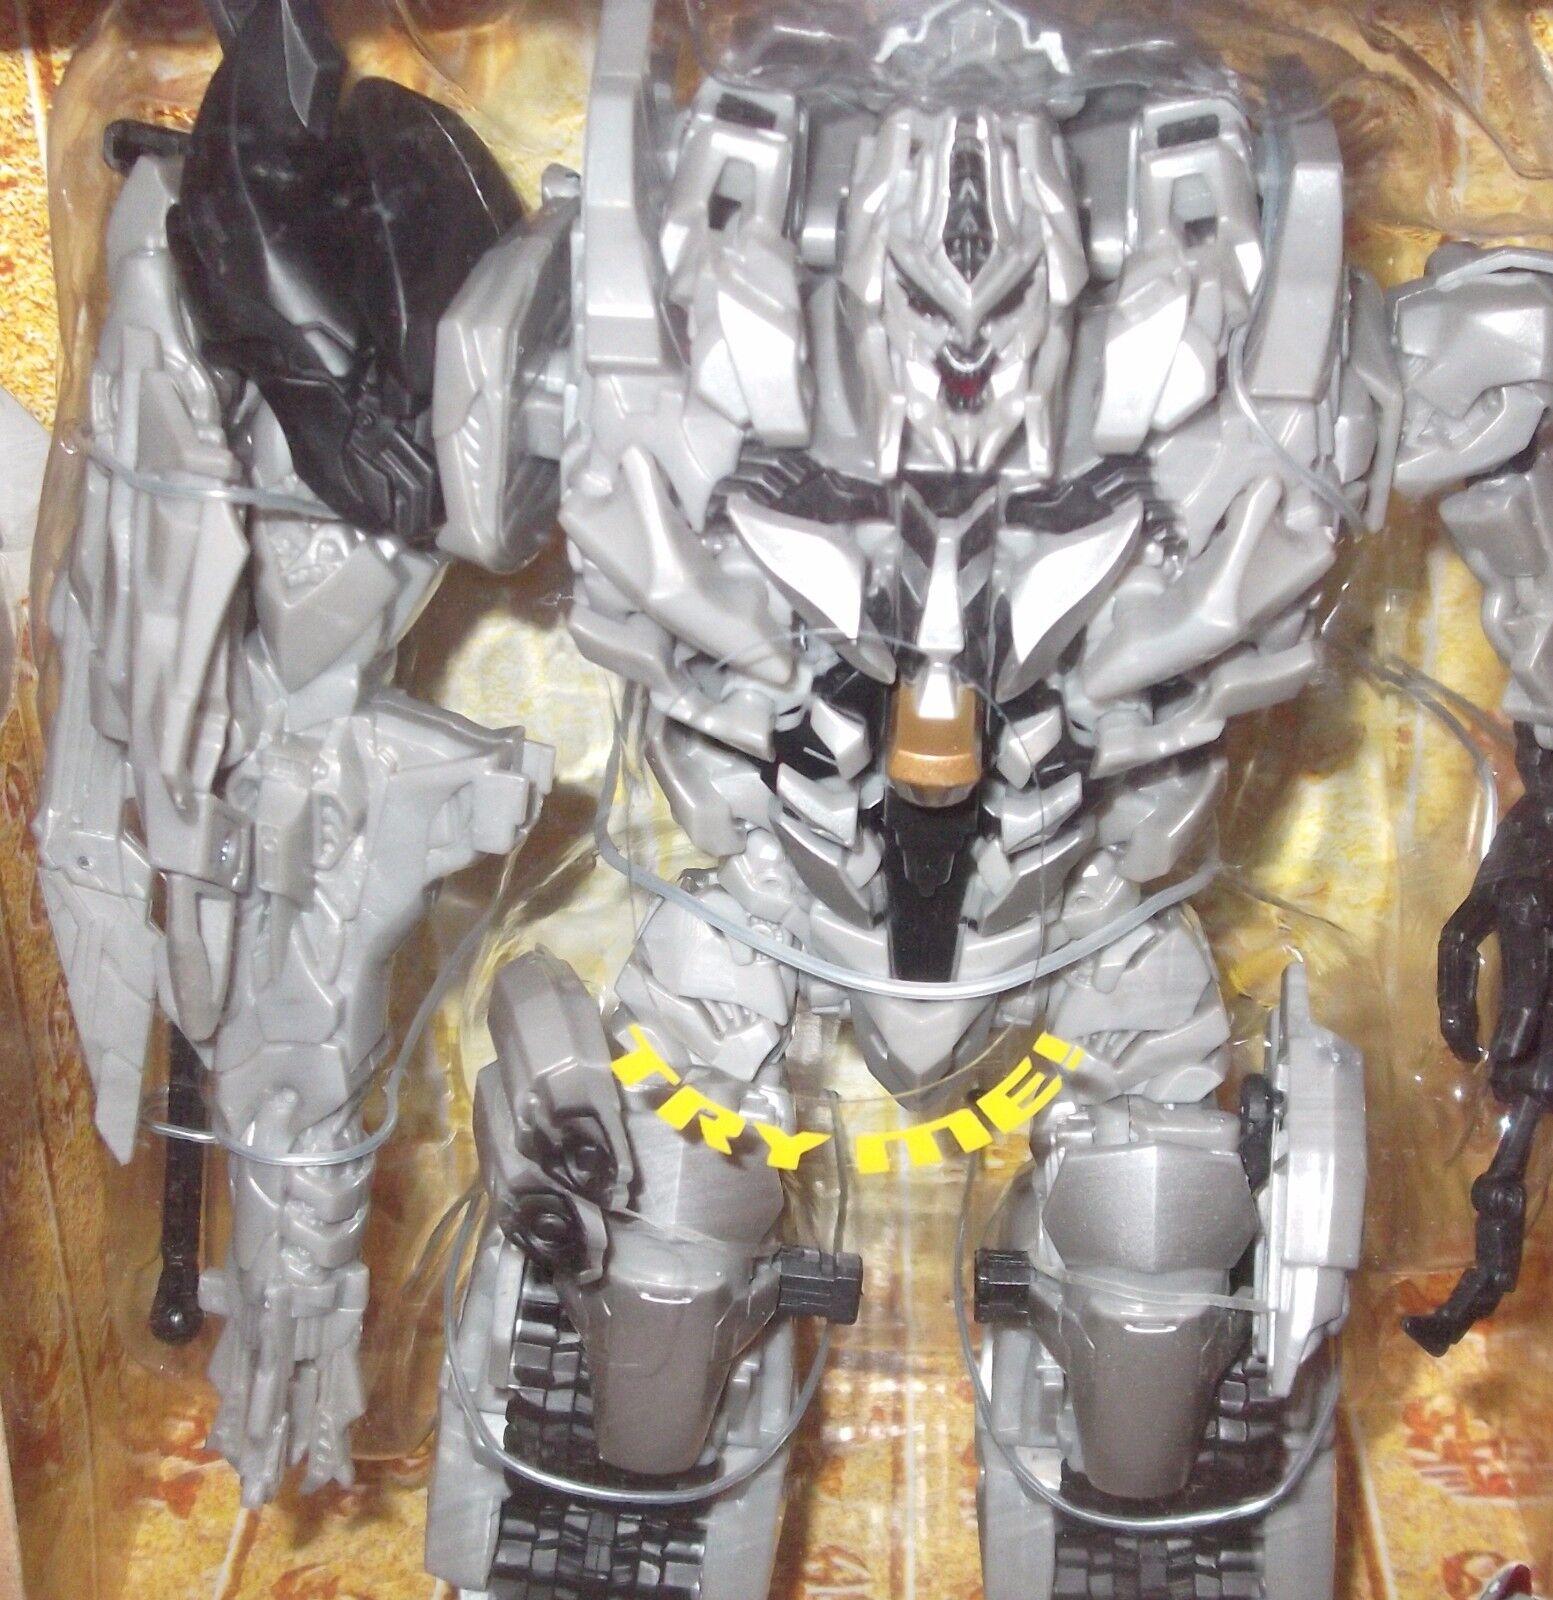 New Transformers Movie 2 rossoF Leader Class Megatron Figure USA VERSION Authentic